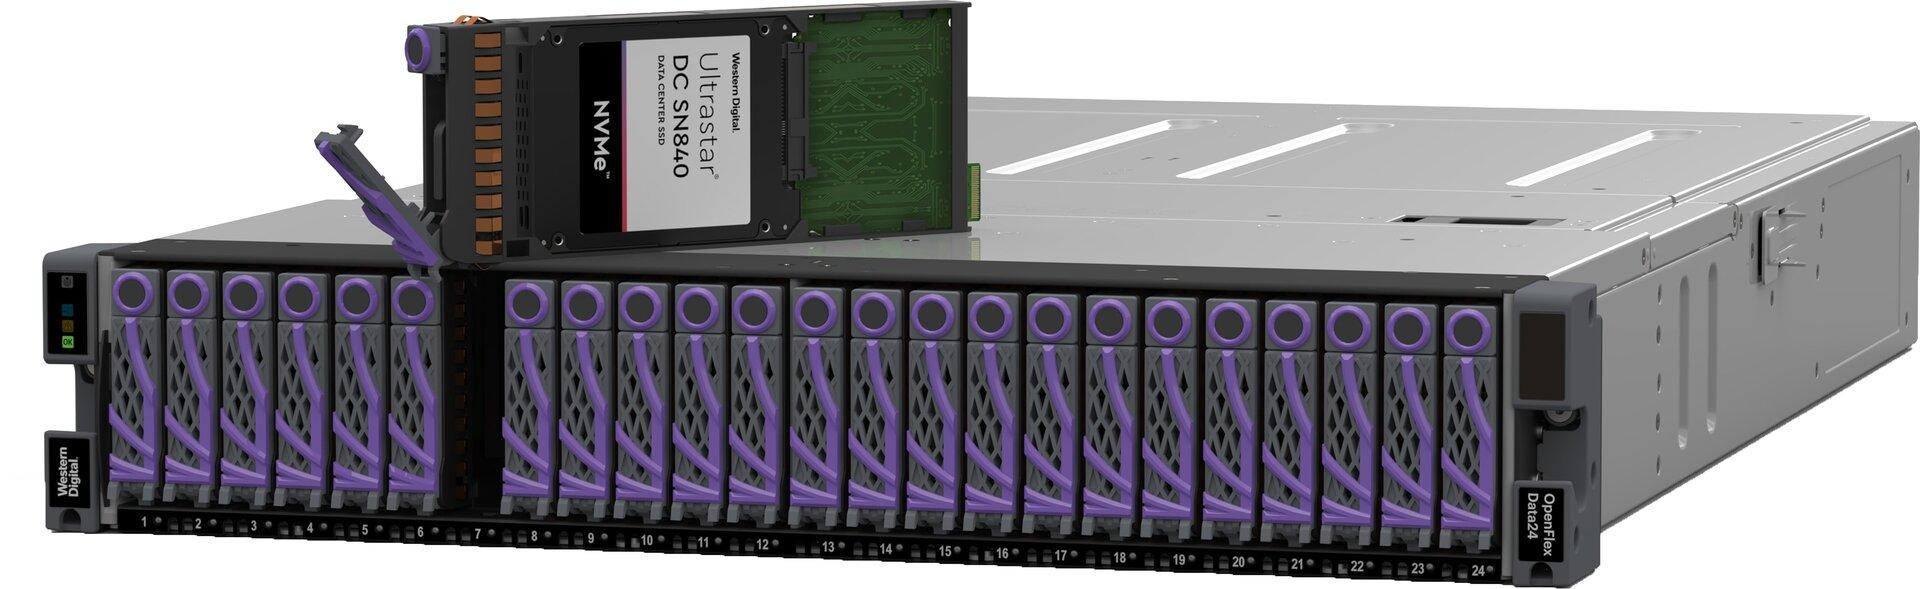 OpenFlex Data24 NVMe-oF-Plattform